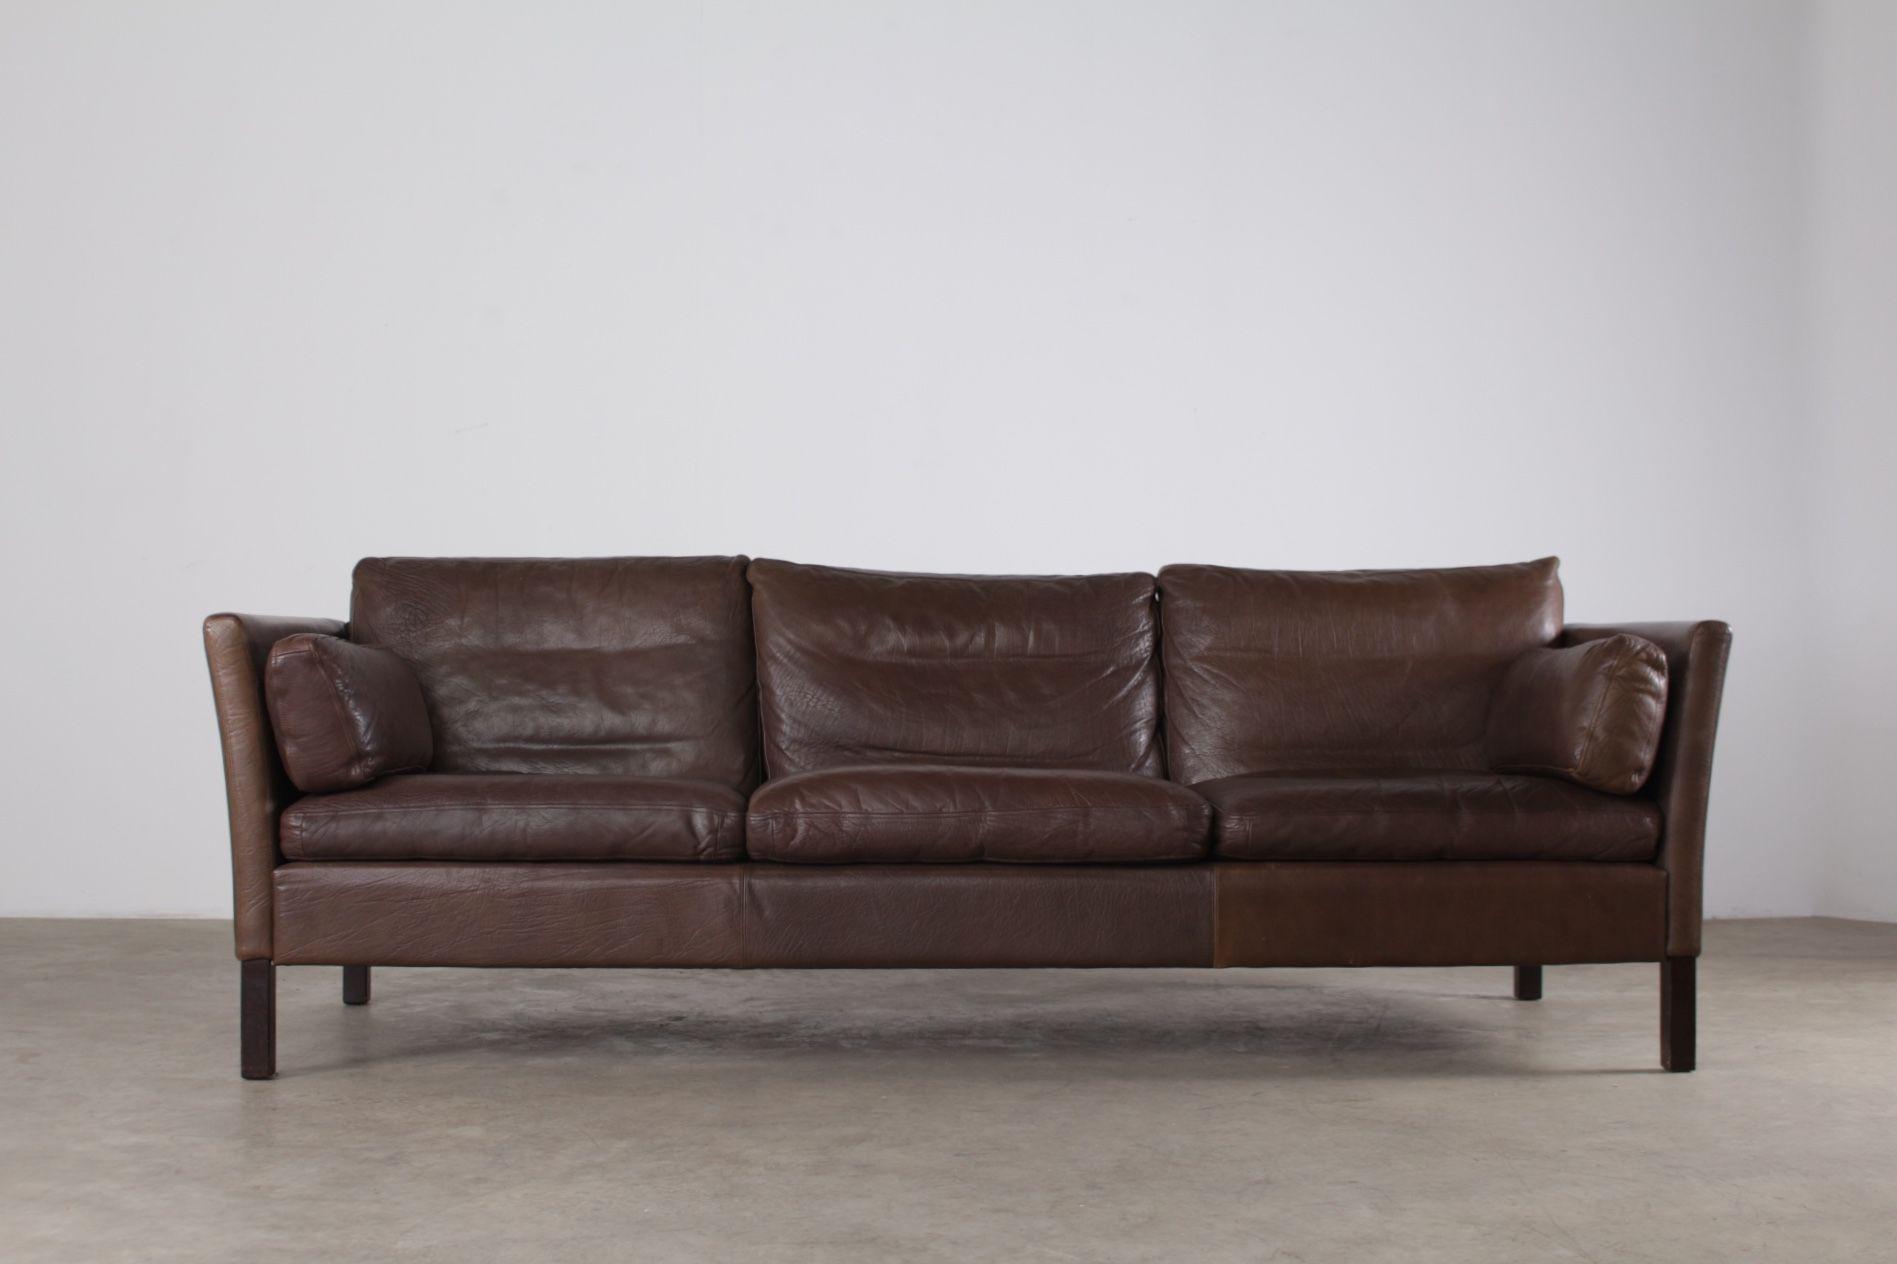 Divan Canapé Sofa Vintage Cuir Scandinave Danemark Style Mogensen